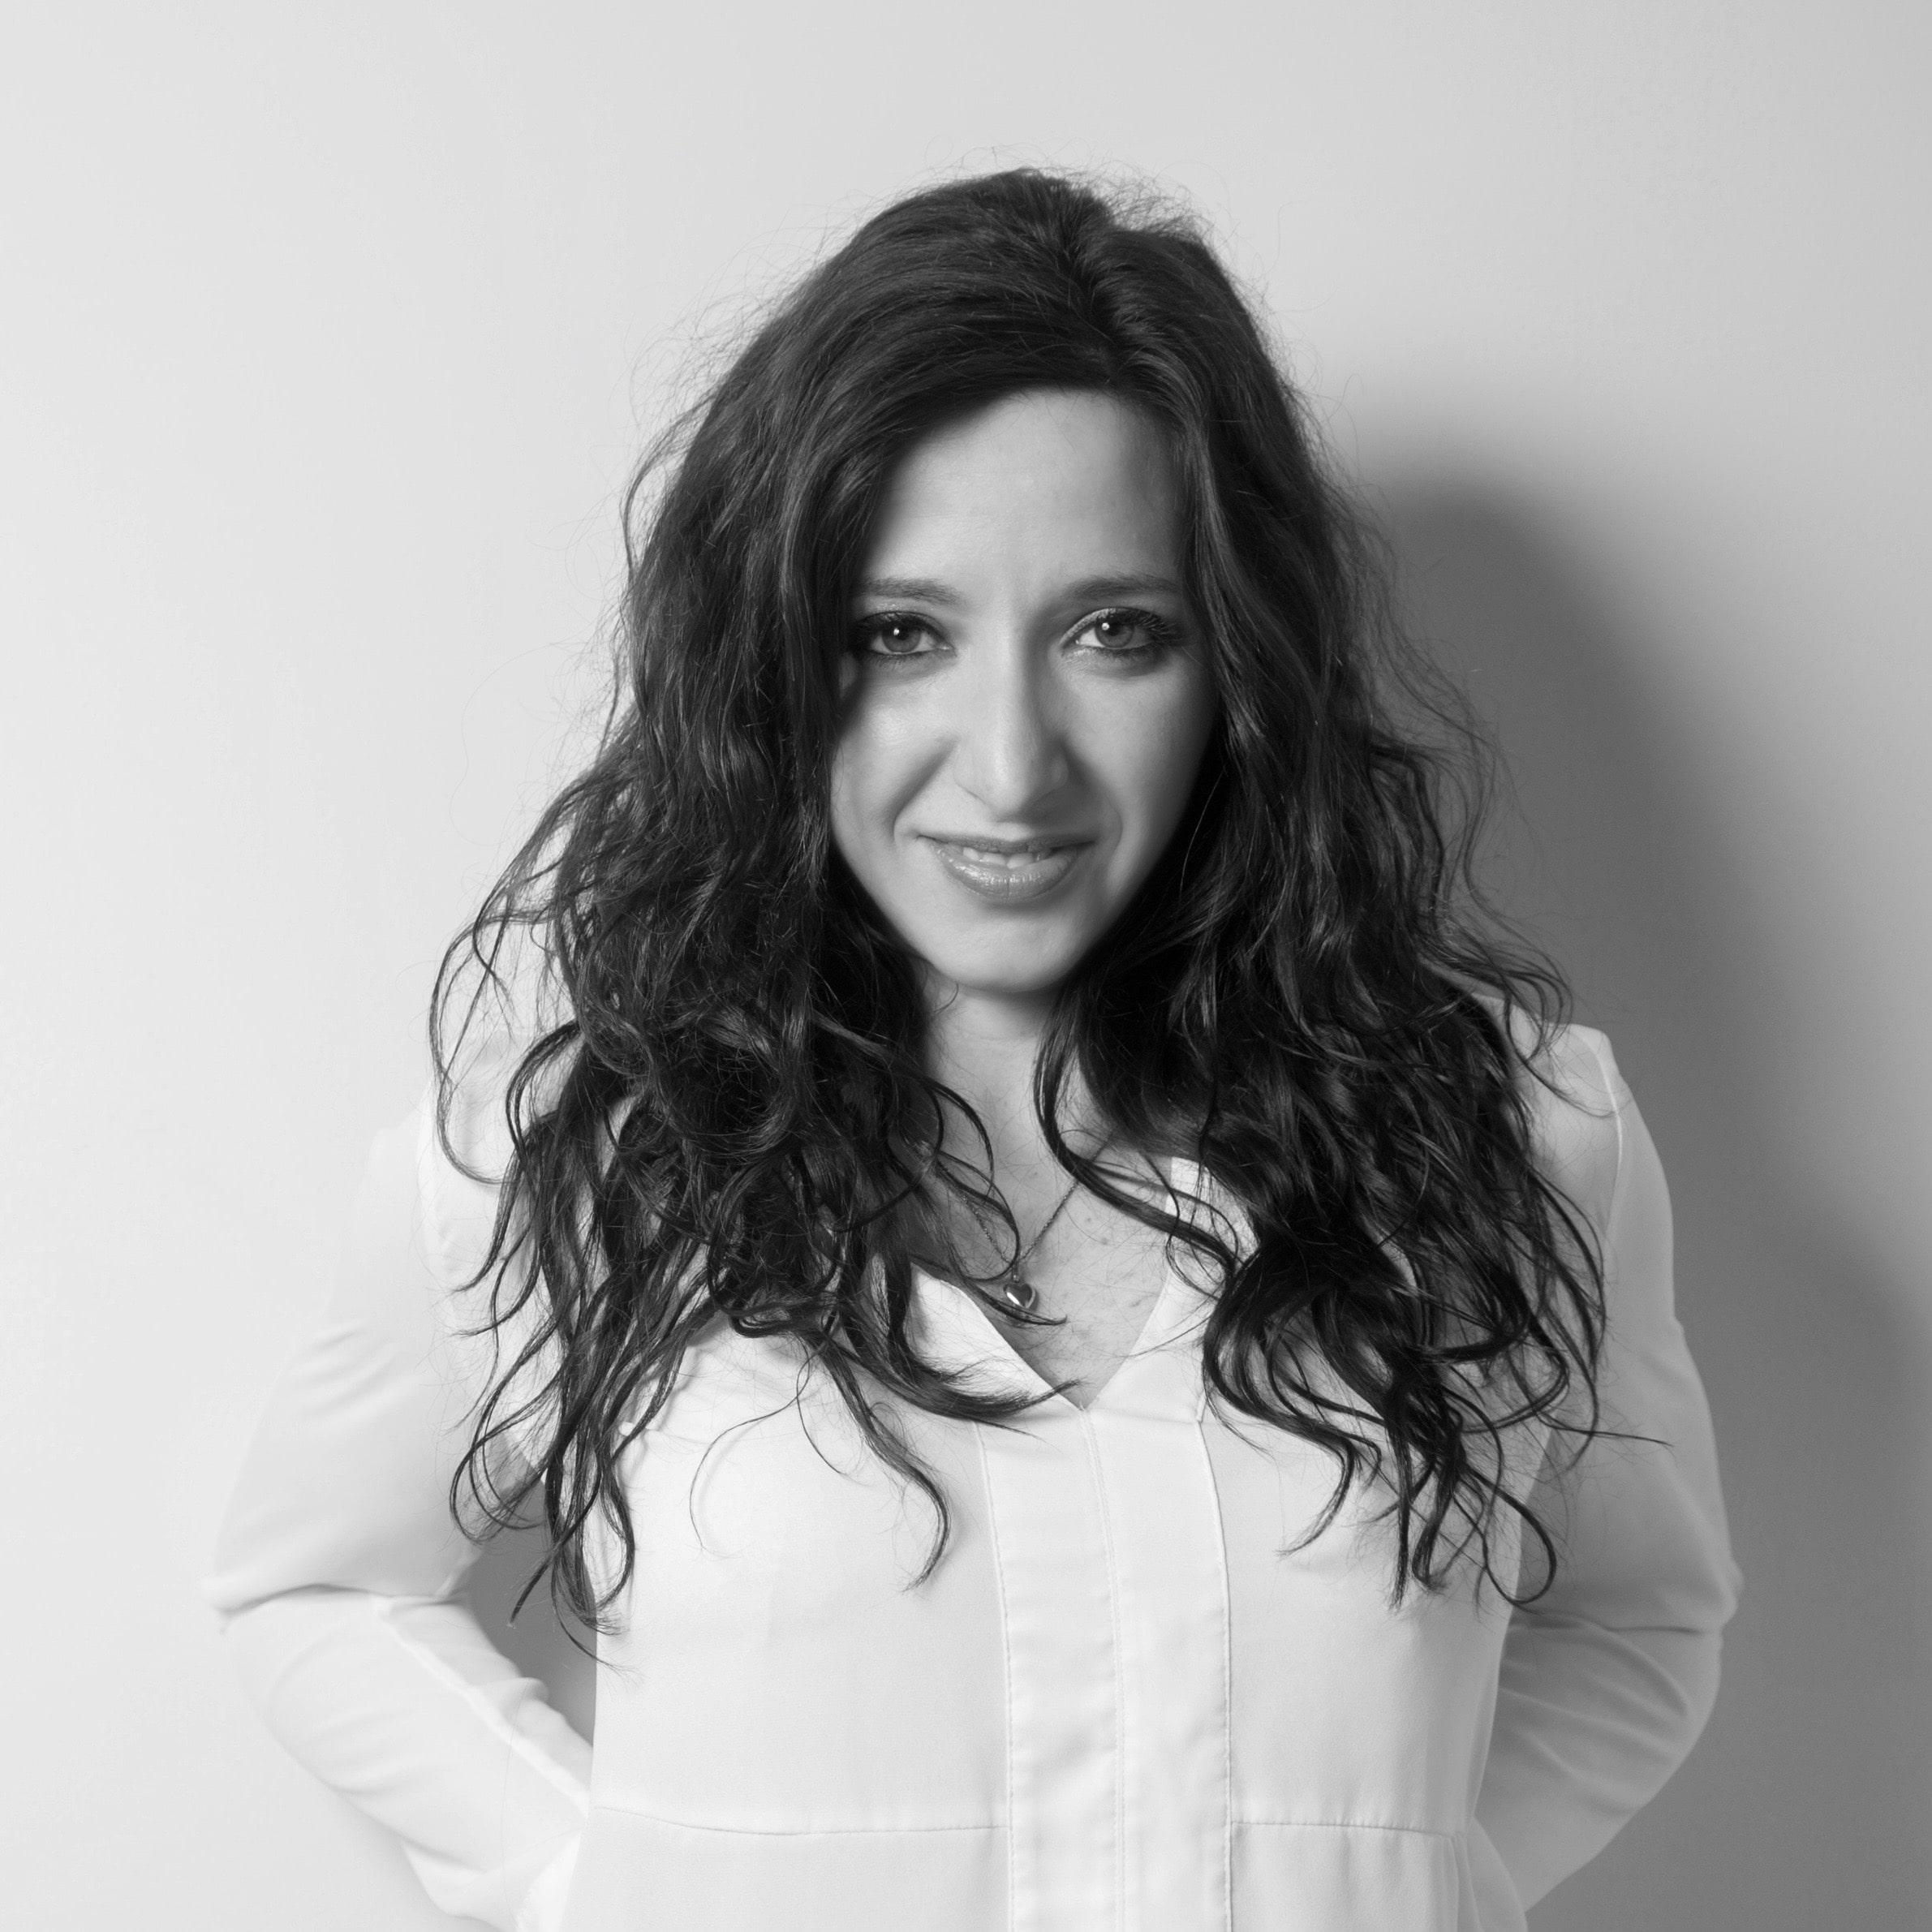 Daria Boffito